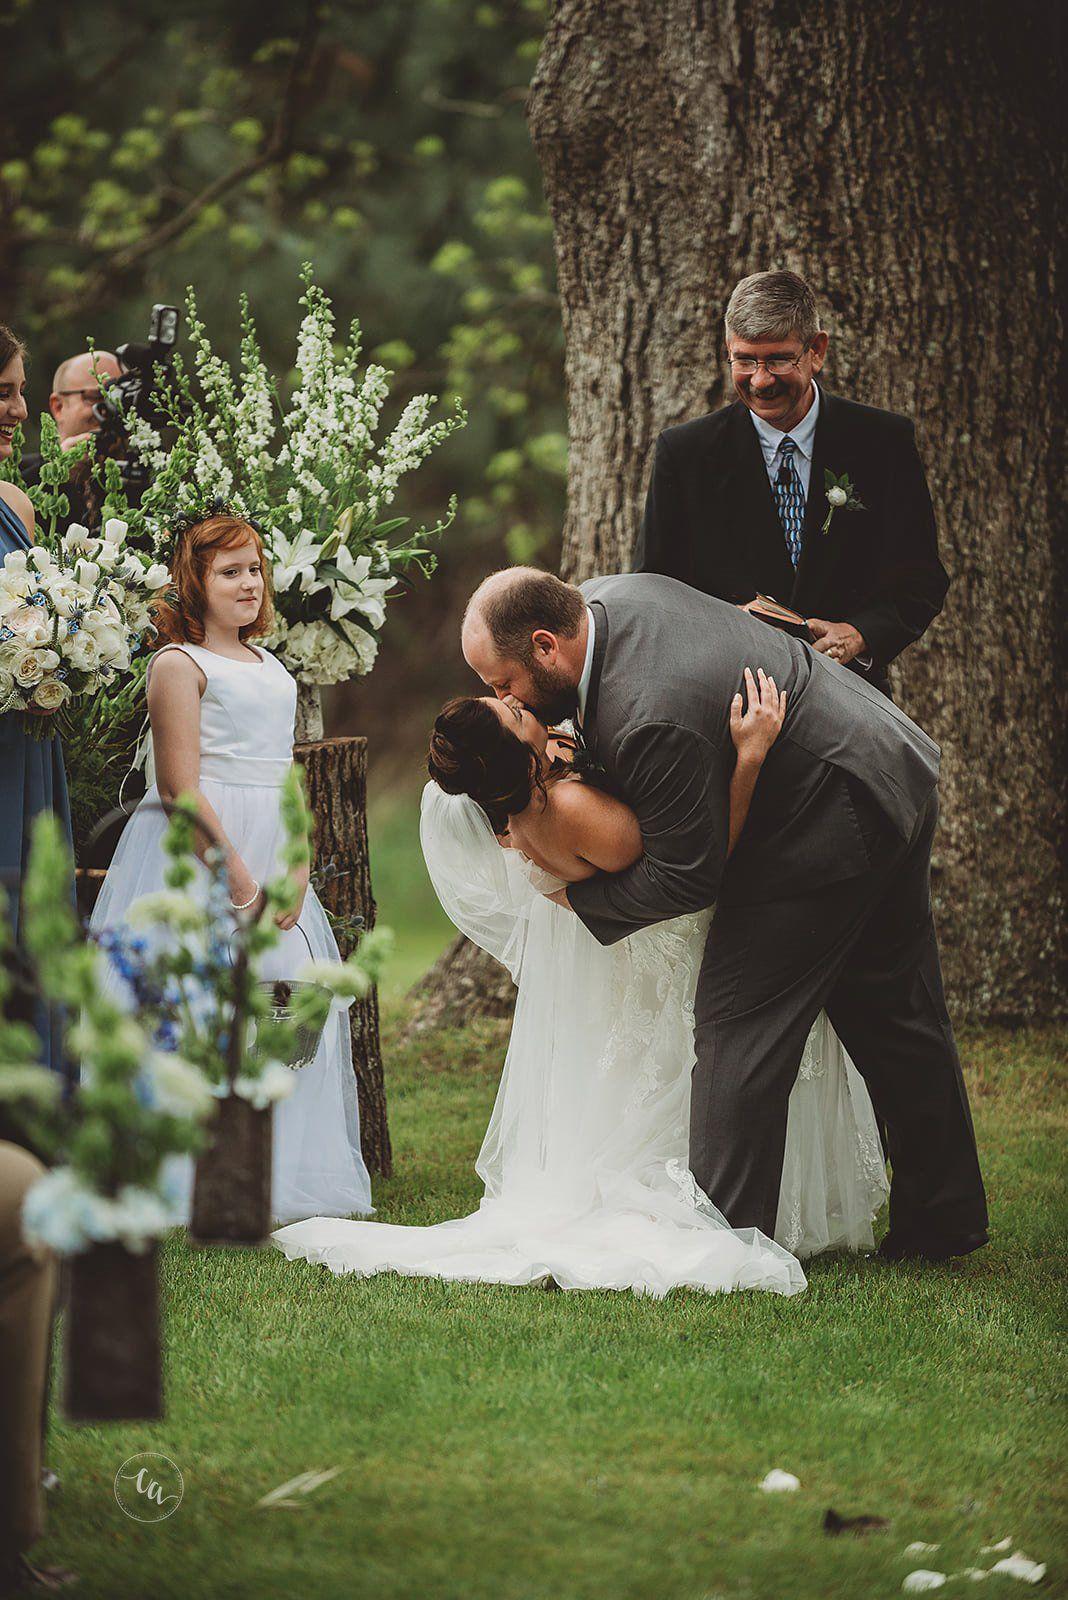 Danielle Matt S Spring Wedding At Twin Oaks Farm Venue With Lodging Pecan